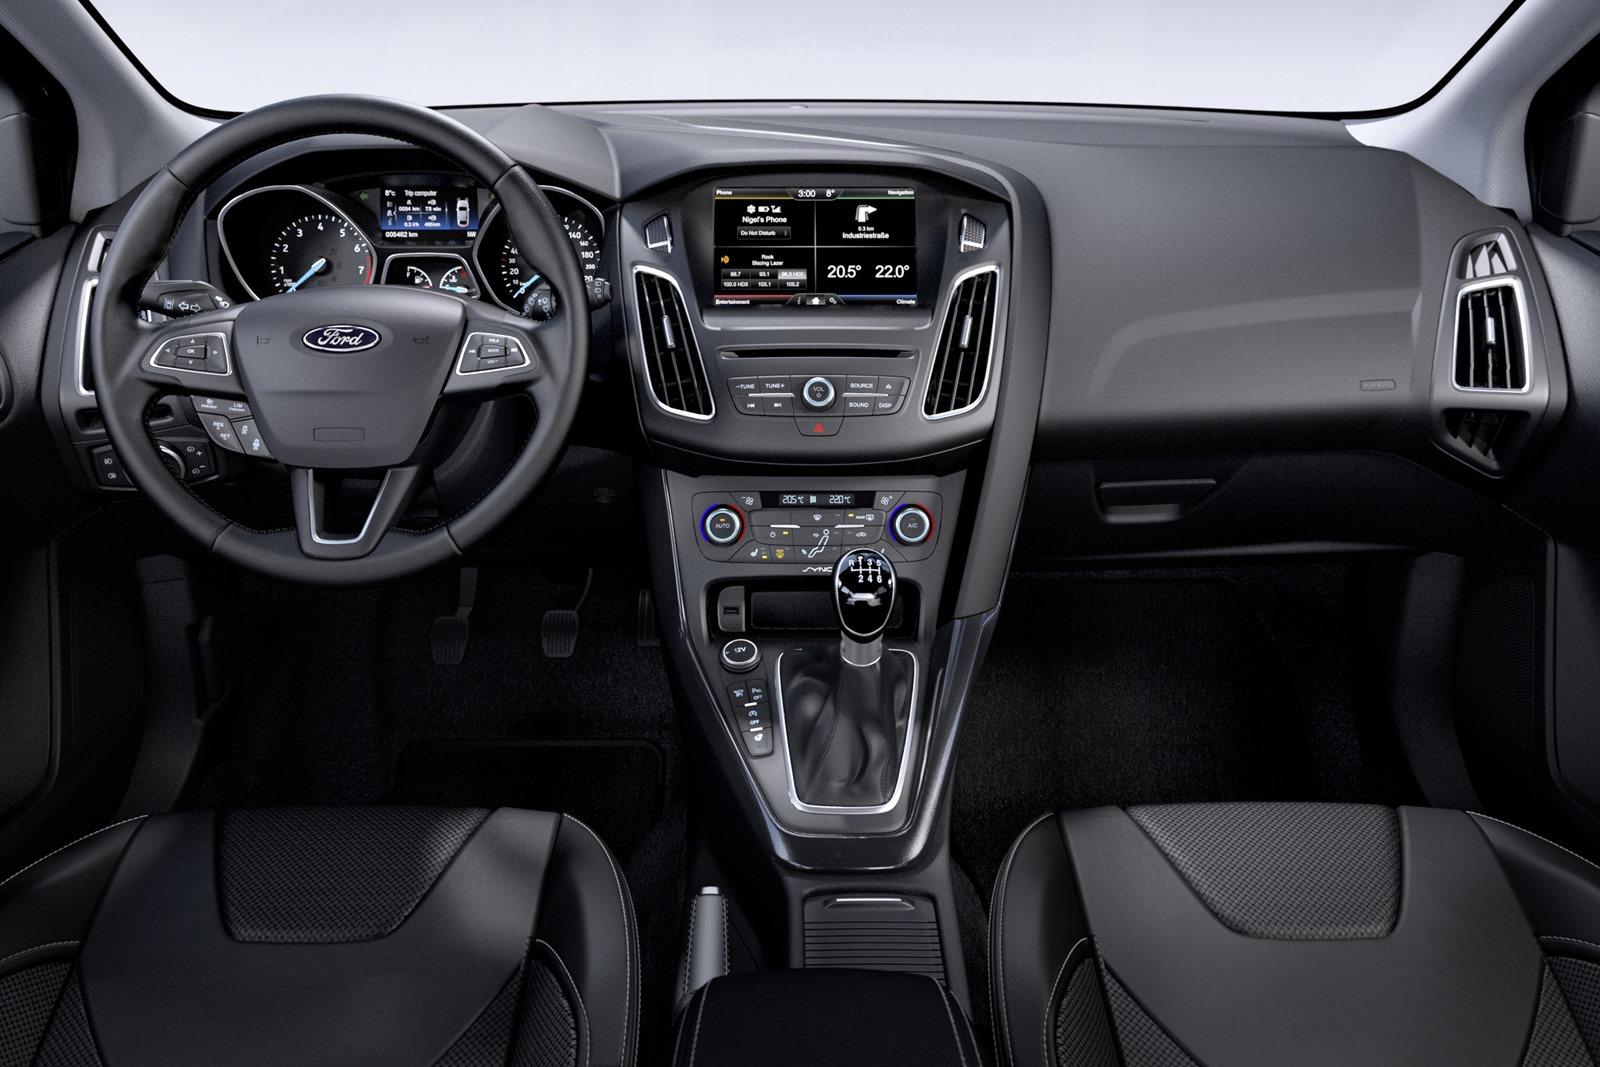 Ford Focus 2015 |Auto-Blog